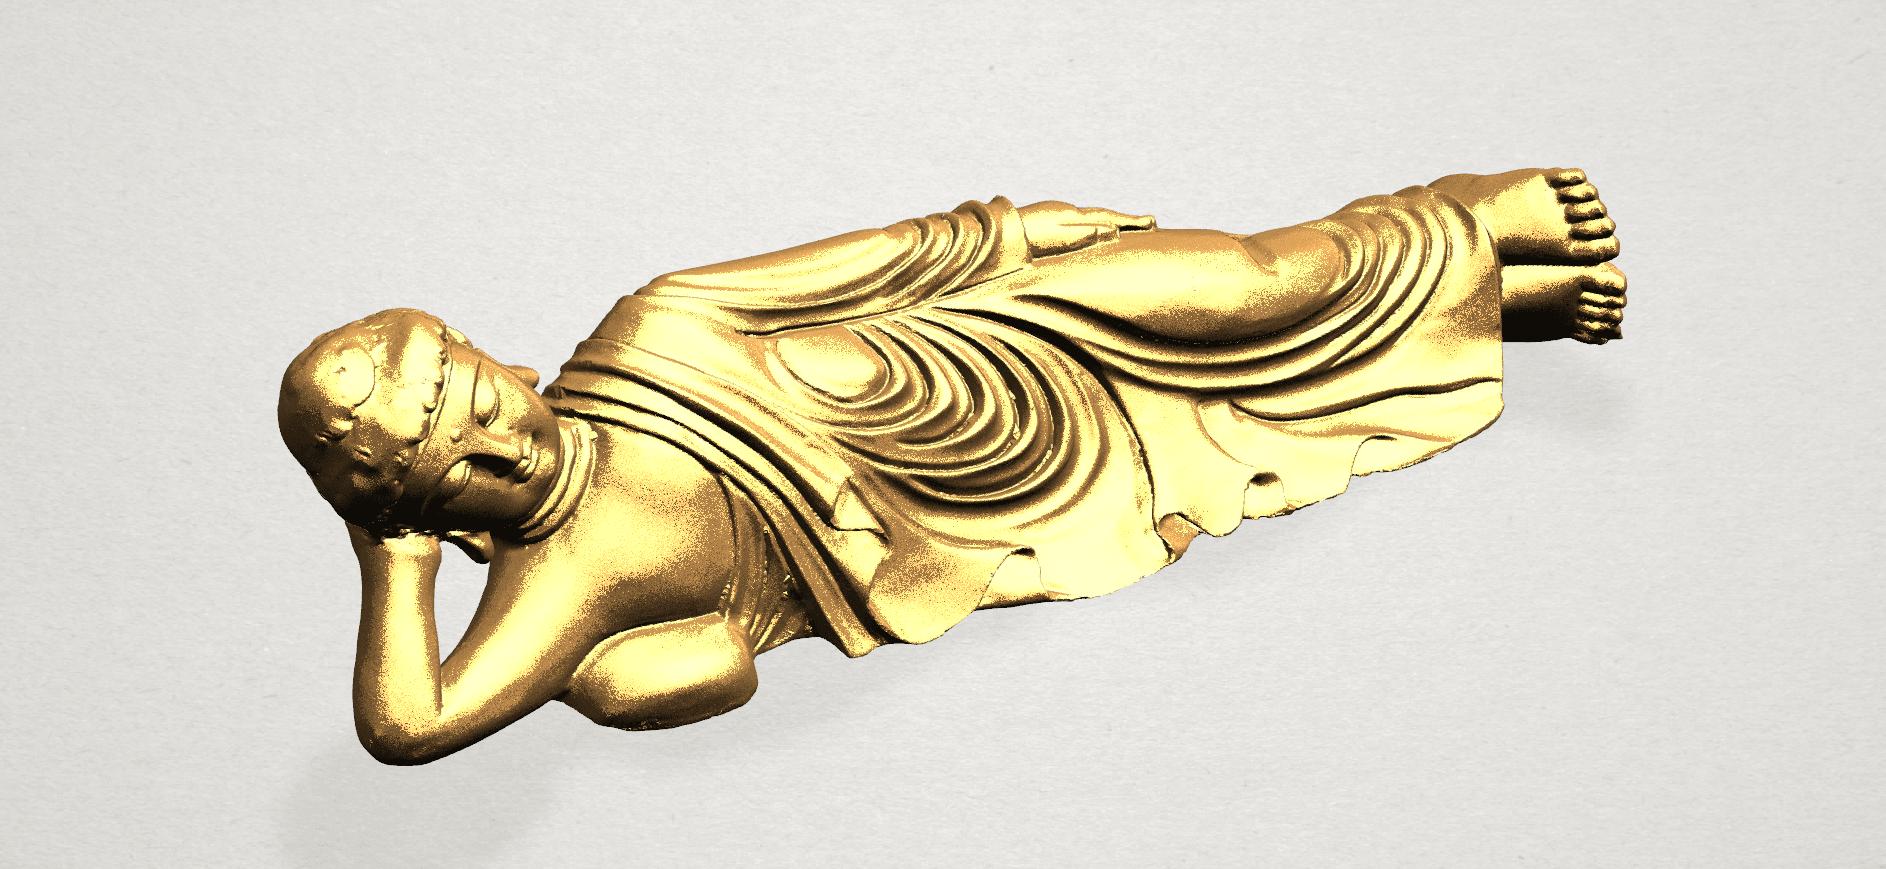 Sleeping Buddha (i) A07.png Download free STL file Sleeping Buddha 01 • 3D printable design, GeorgesNikkei